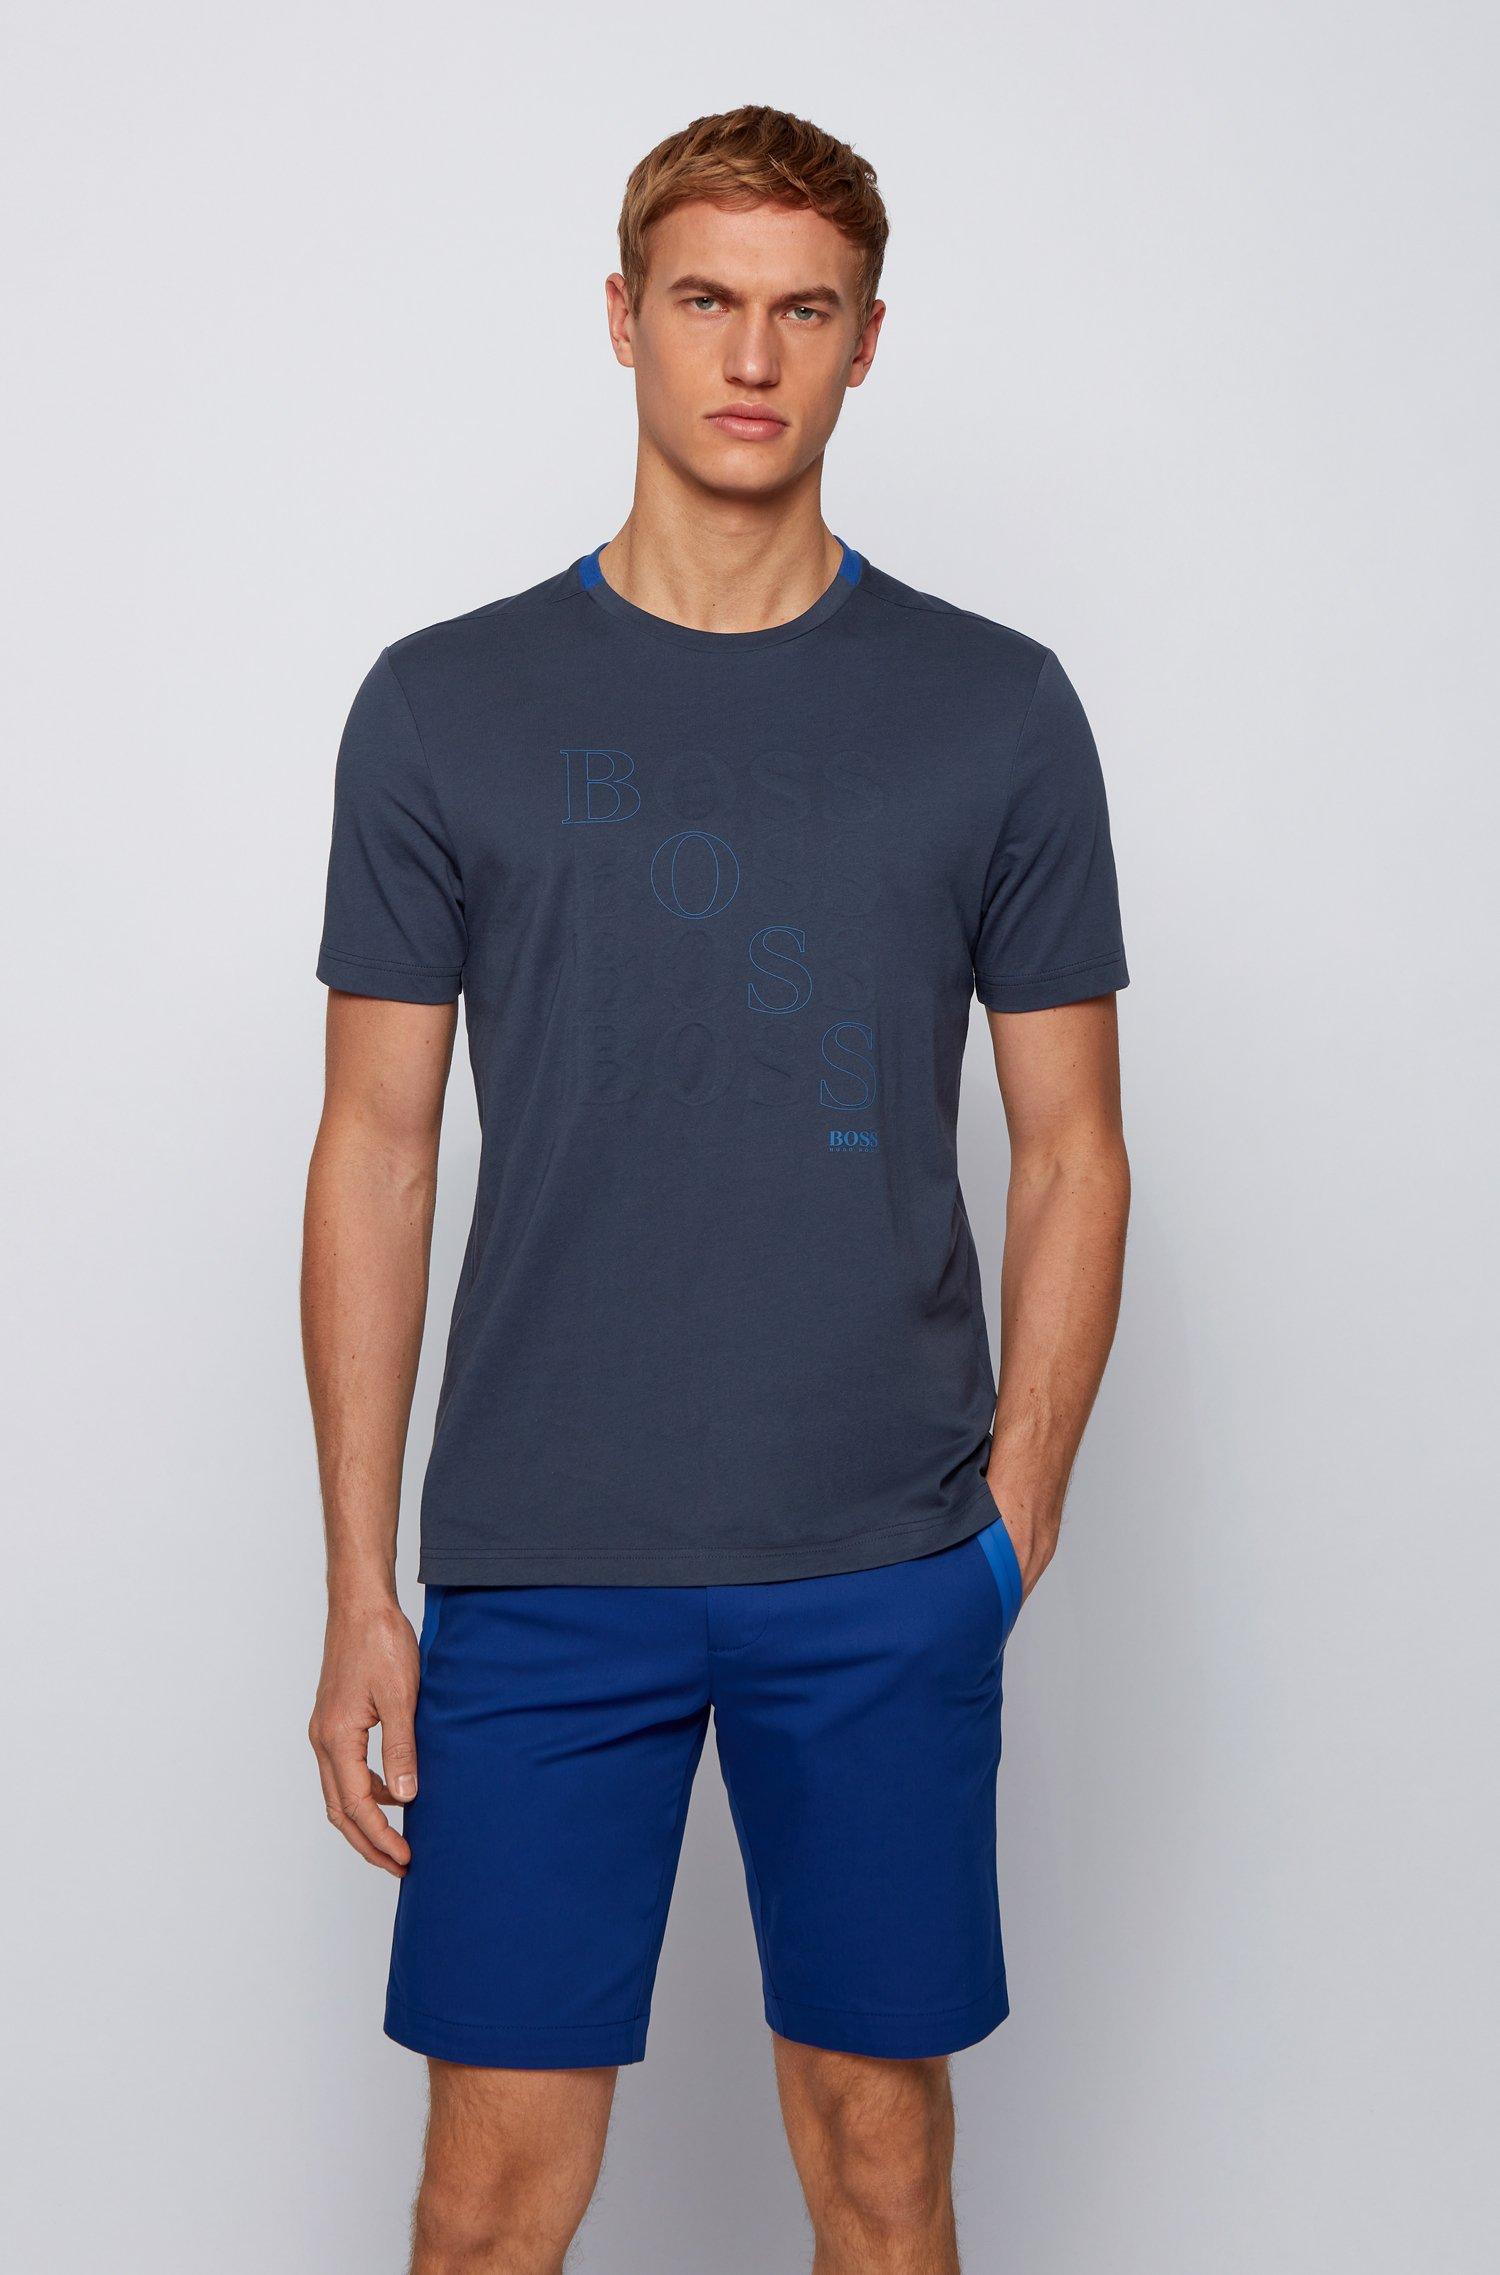 Regular-fit logo T-shirt in Bionic® single jersey, Dark Blue